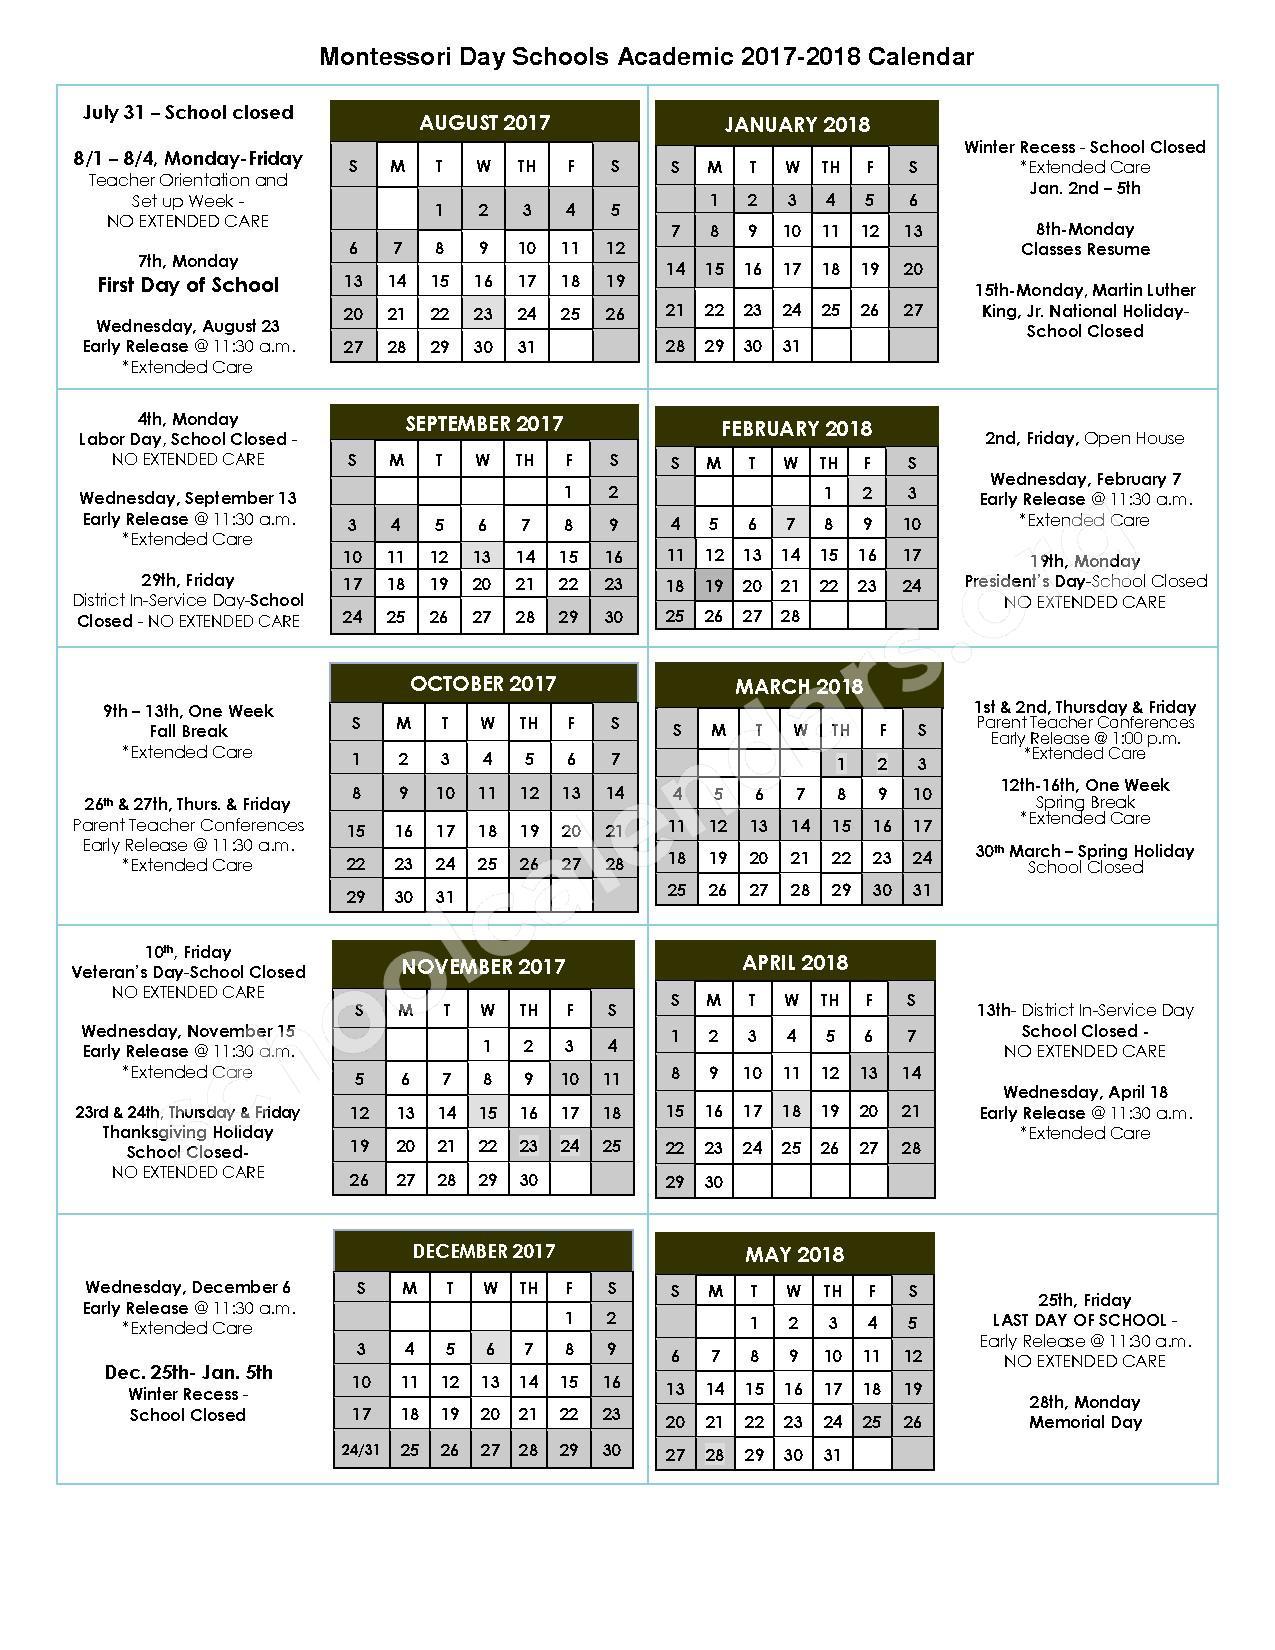 2017 - 2018 School Calendar – Montessori Day Schools – page 1